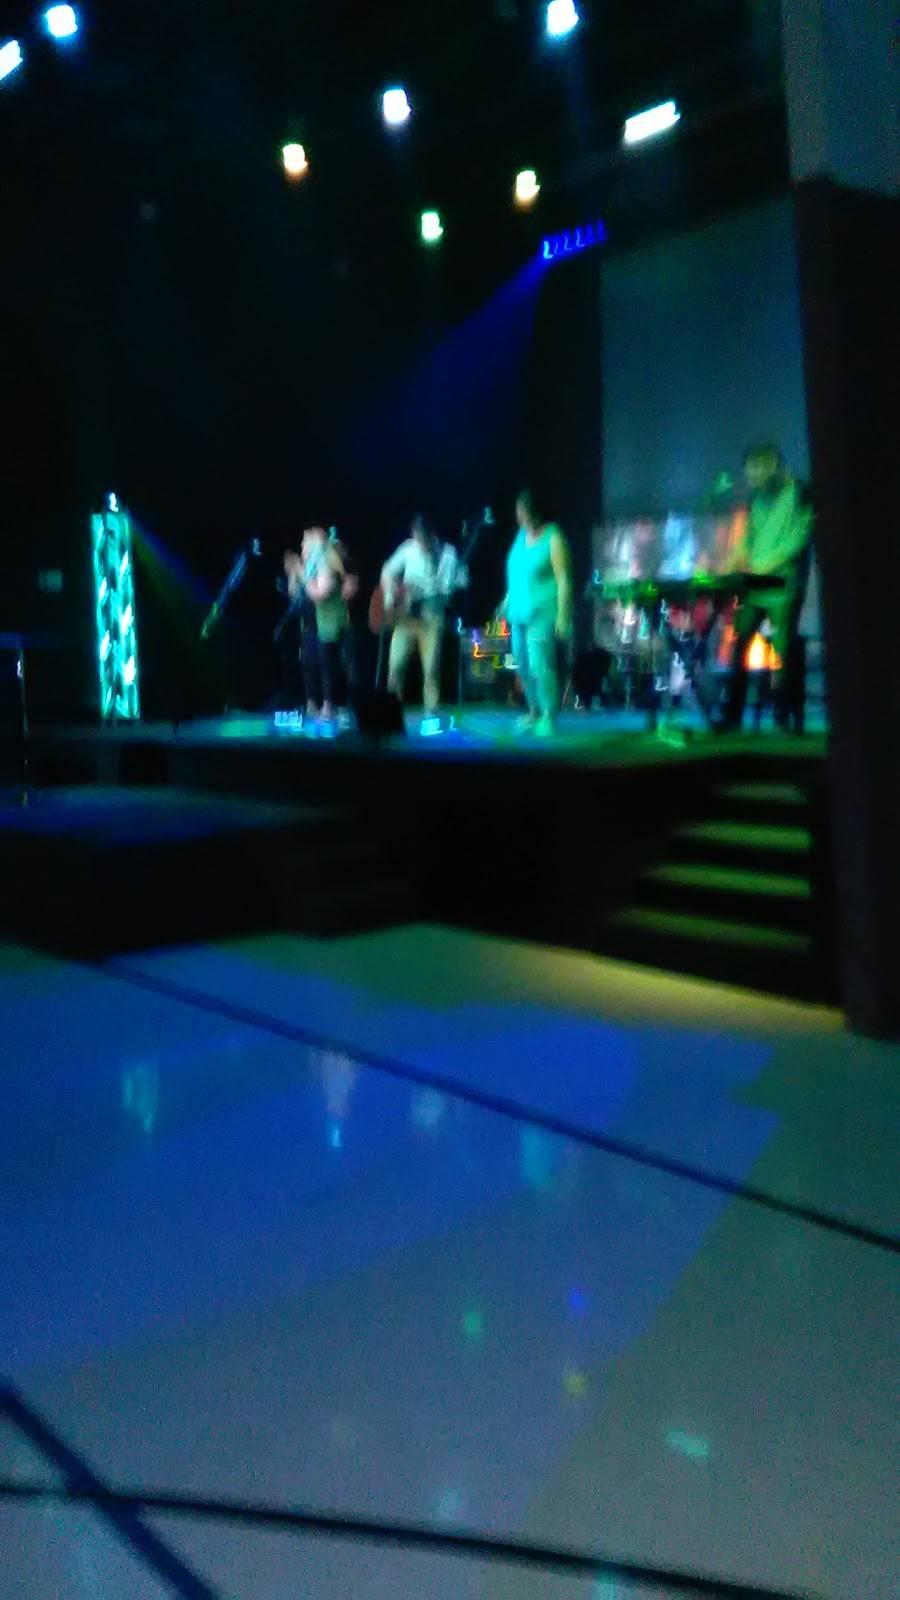 CrossLink Community Church - church  | Photo 9 of 10 | Address: 4747 Harrisburg Pike, Grove City, OH 43123, USA | Phone: (614) 907-6306